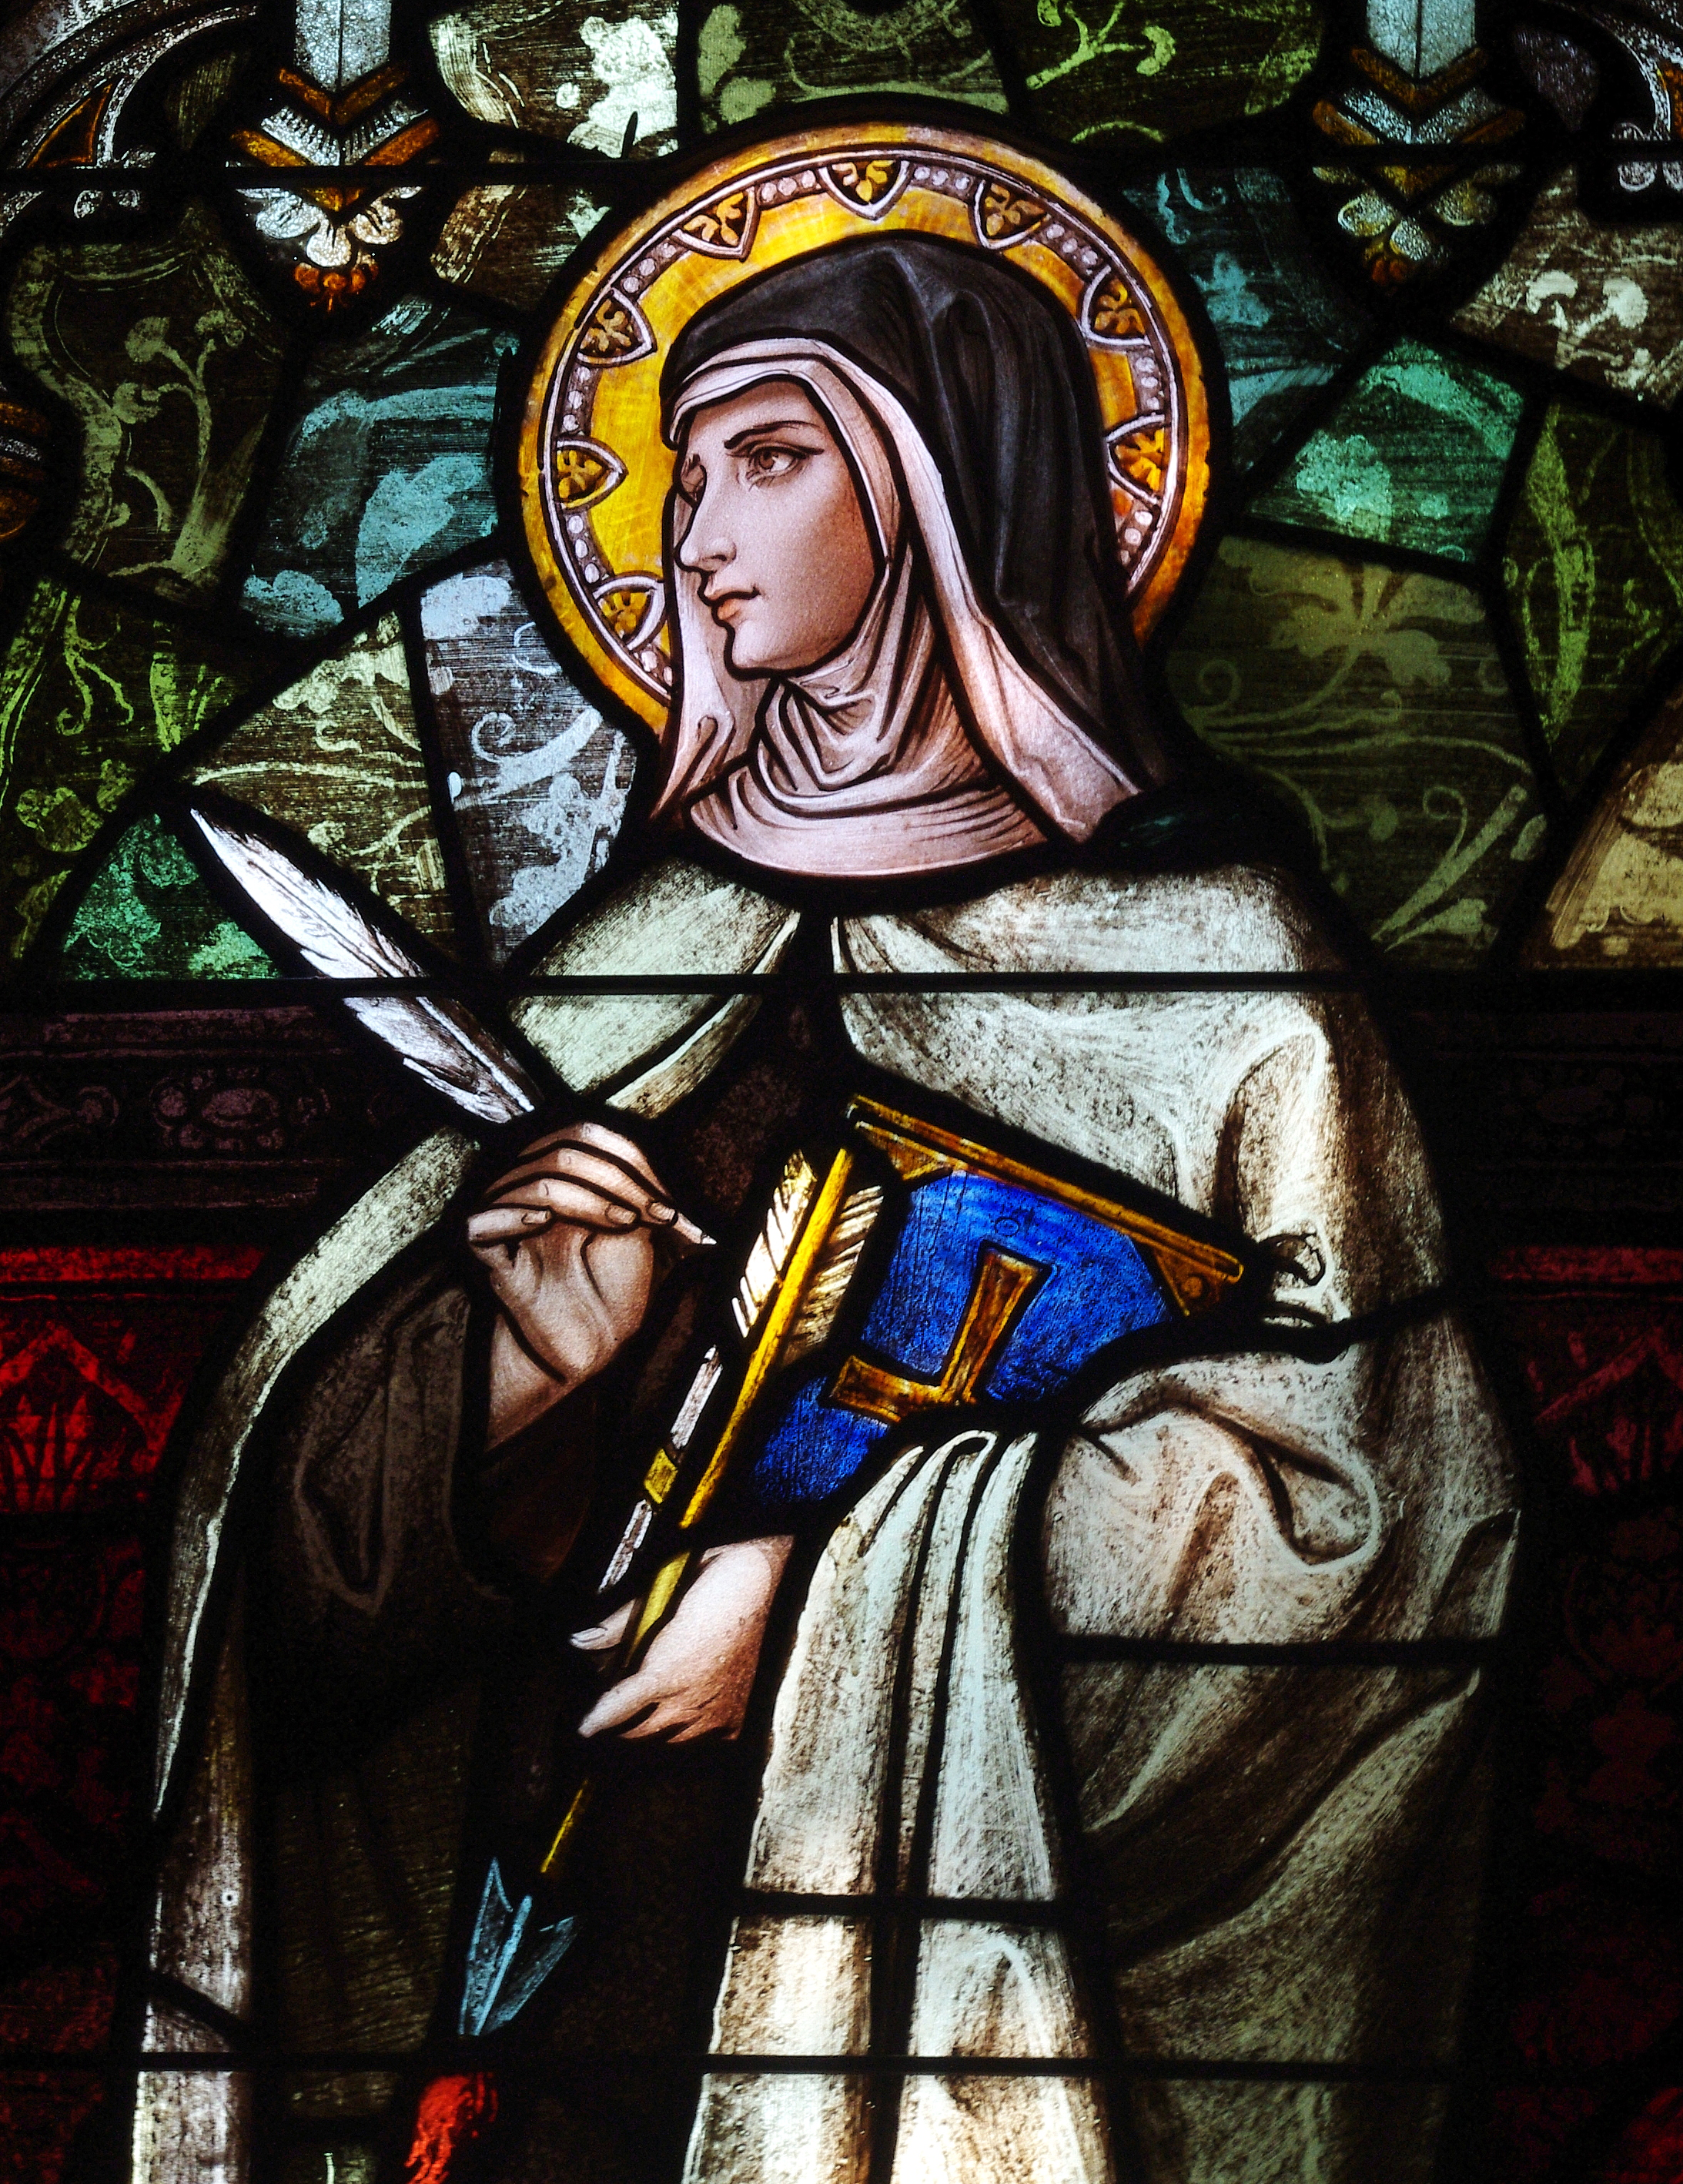 Saint single patron women of Cultural Catholic